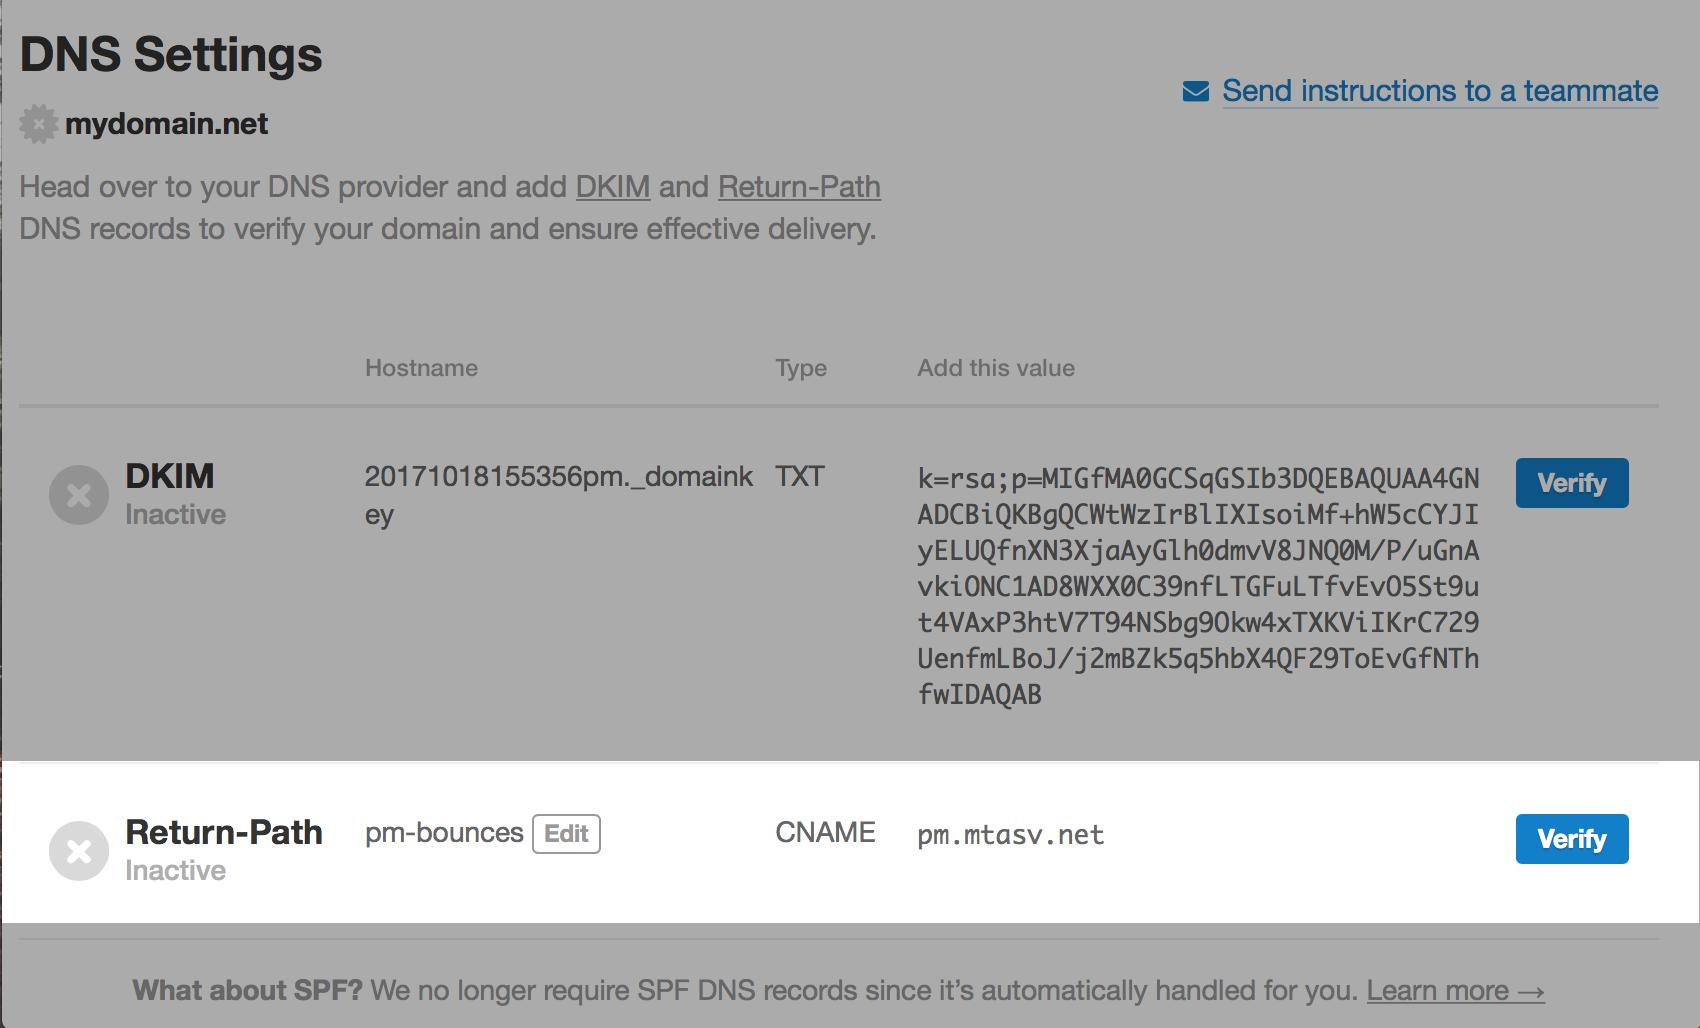 Return-Path DNS record